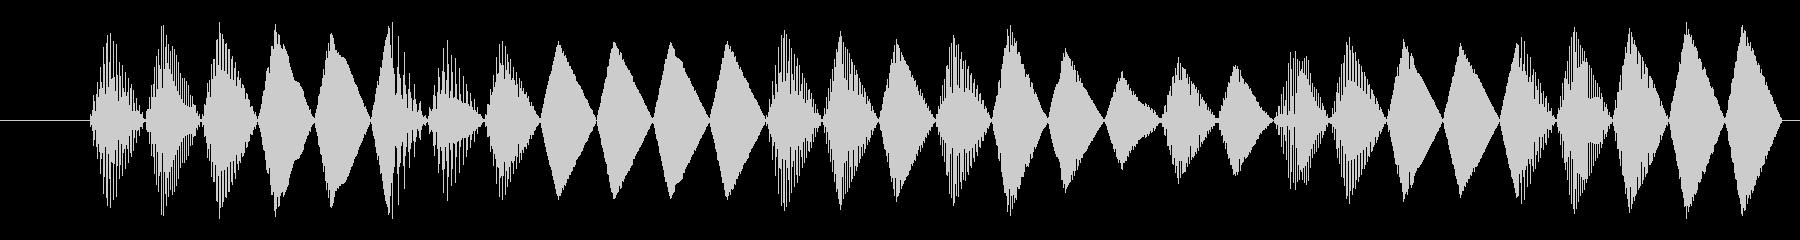 FX レーザーガン03の未再生の波形